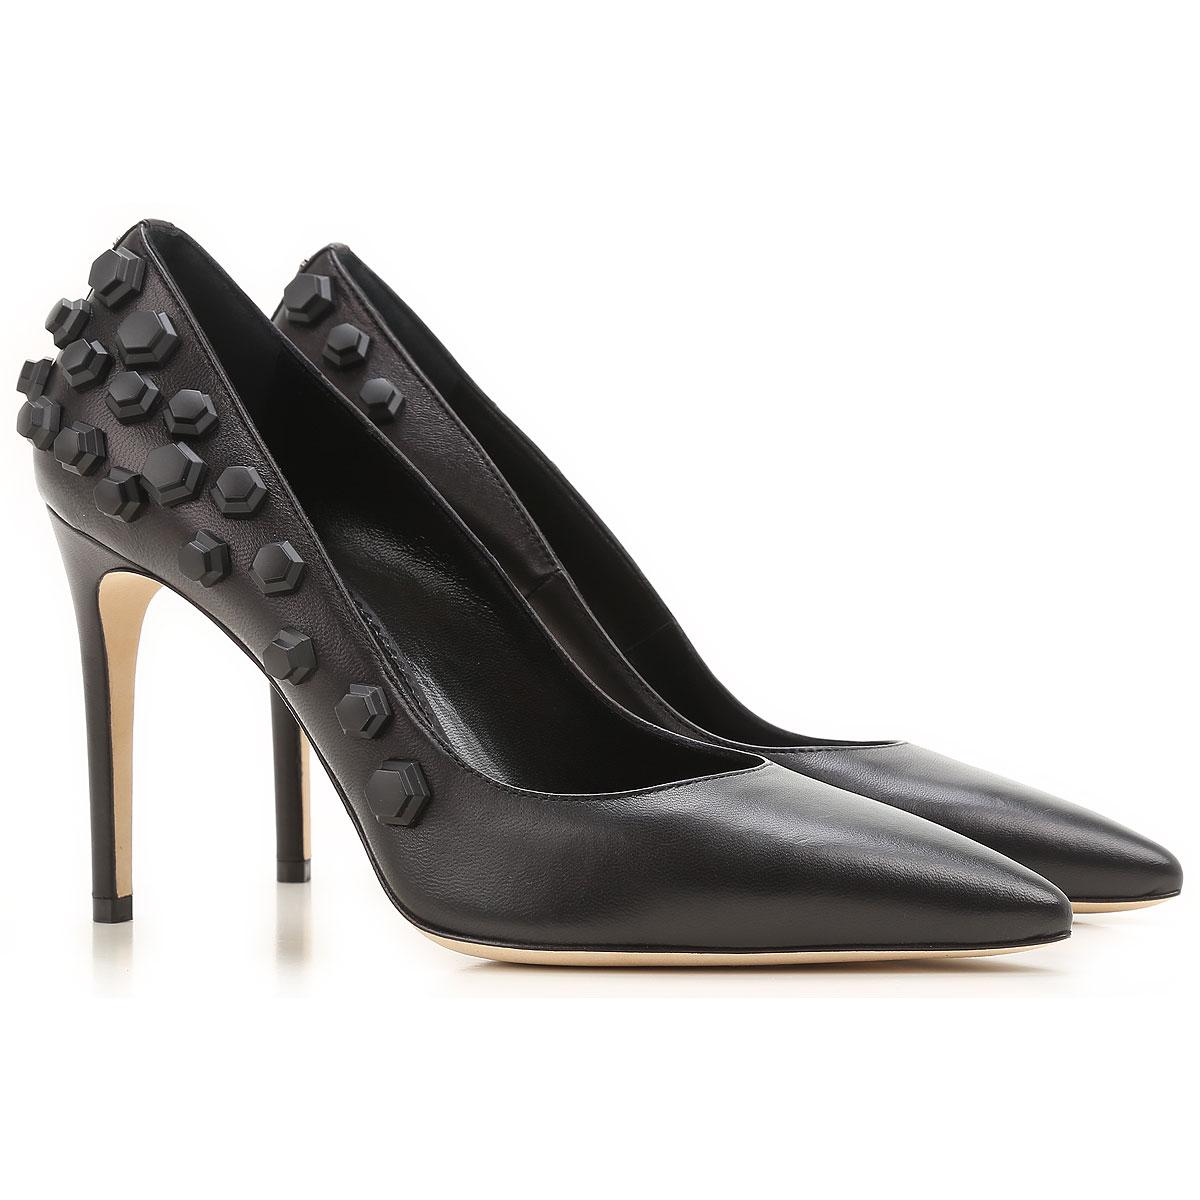 chaussures femme dsquared code produit a201 218 2124. Black Bedroom Furniture Sets. Home Design Ideas